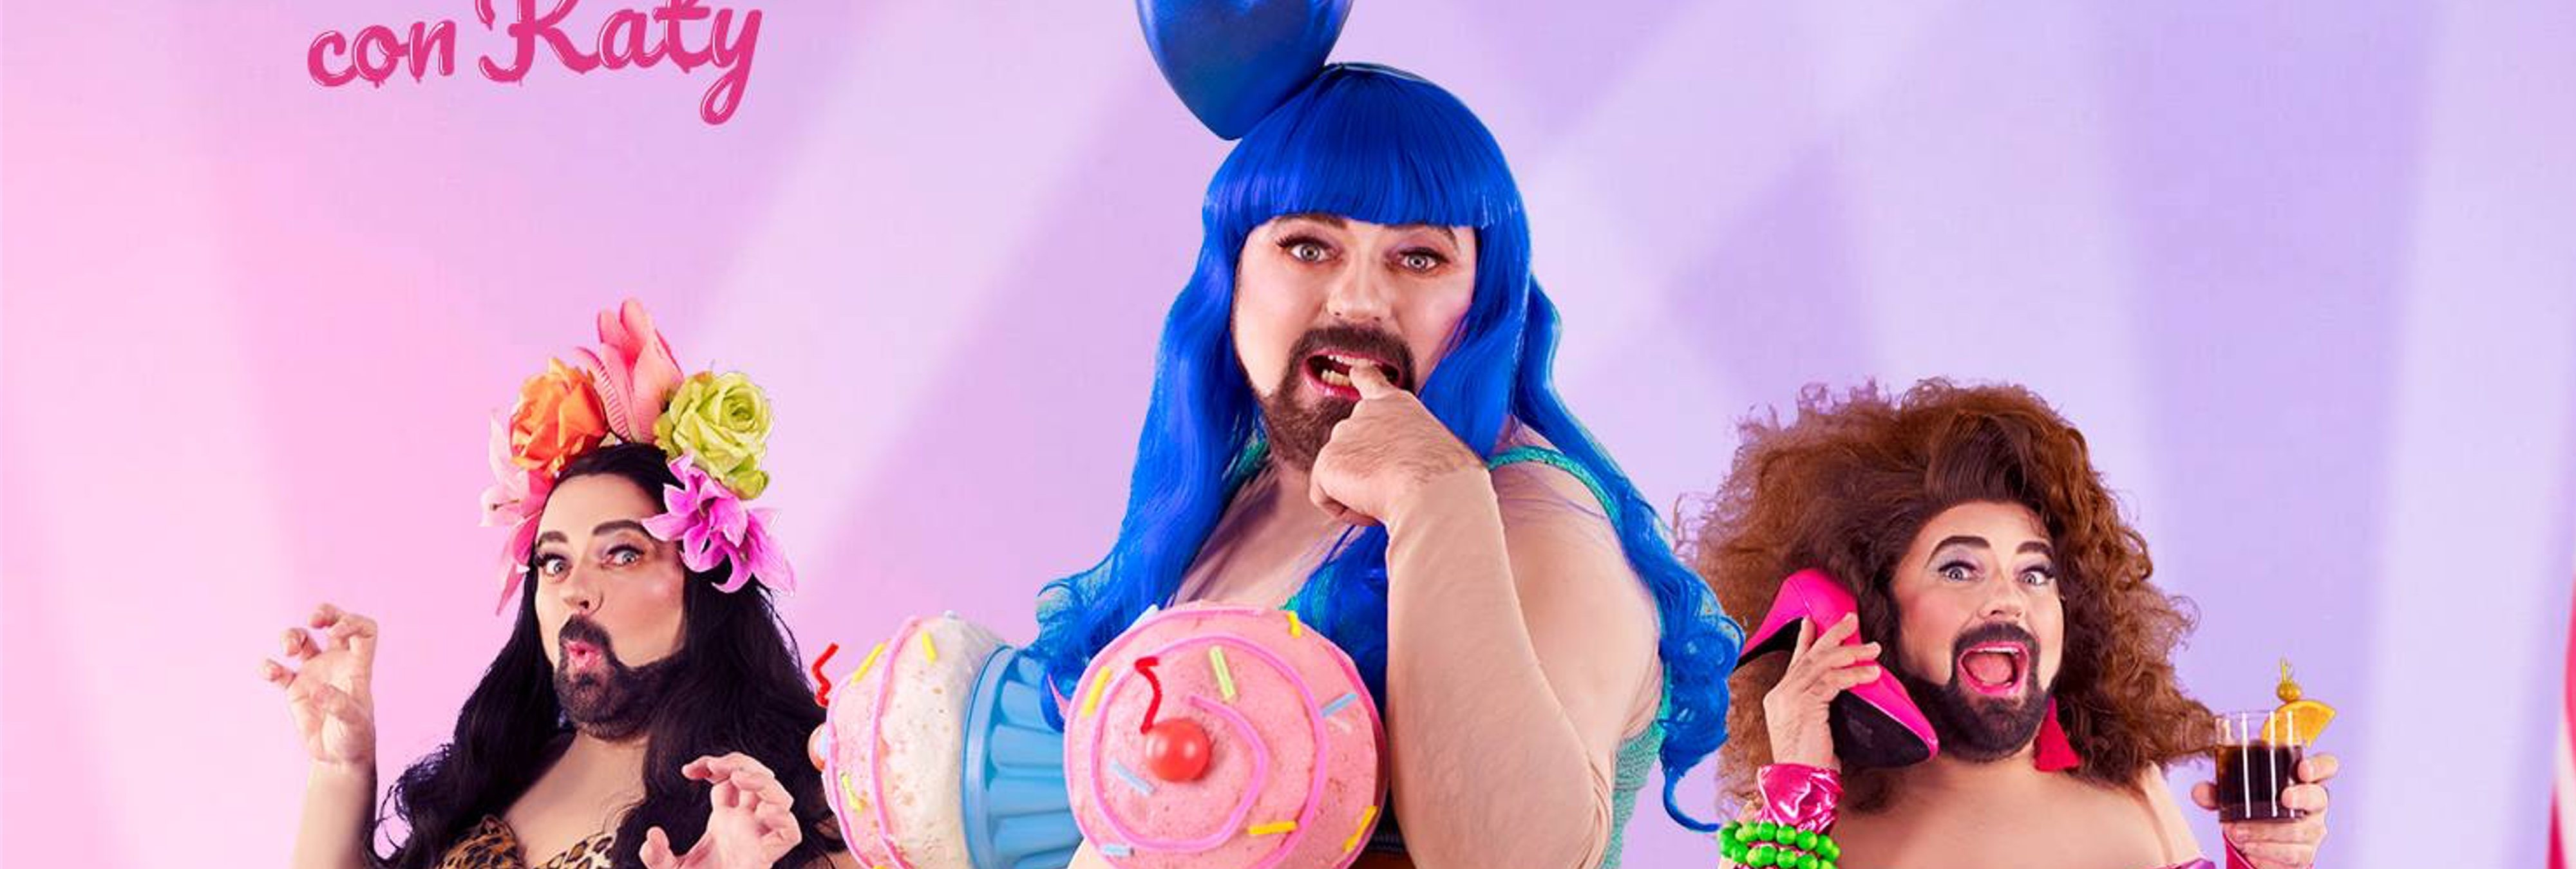 La fiesta LGTBI 'Tanga! Party' volverá a celebrarse en el Teatro Barceló 3 meses después del mitin de VOX